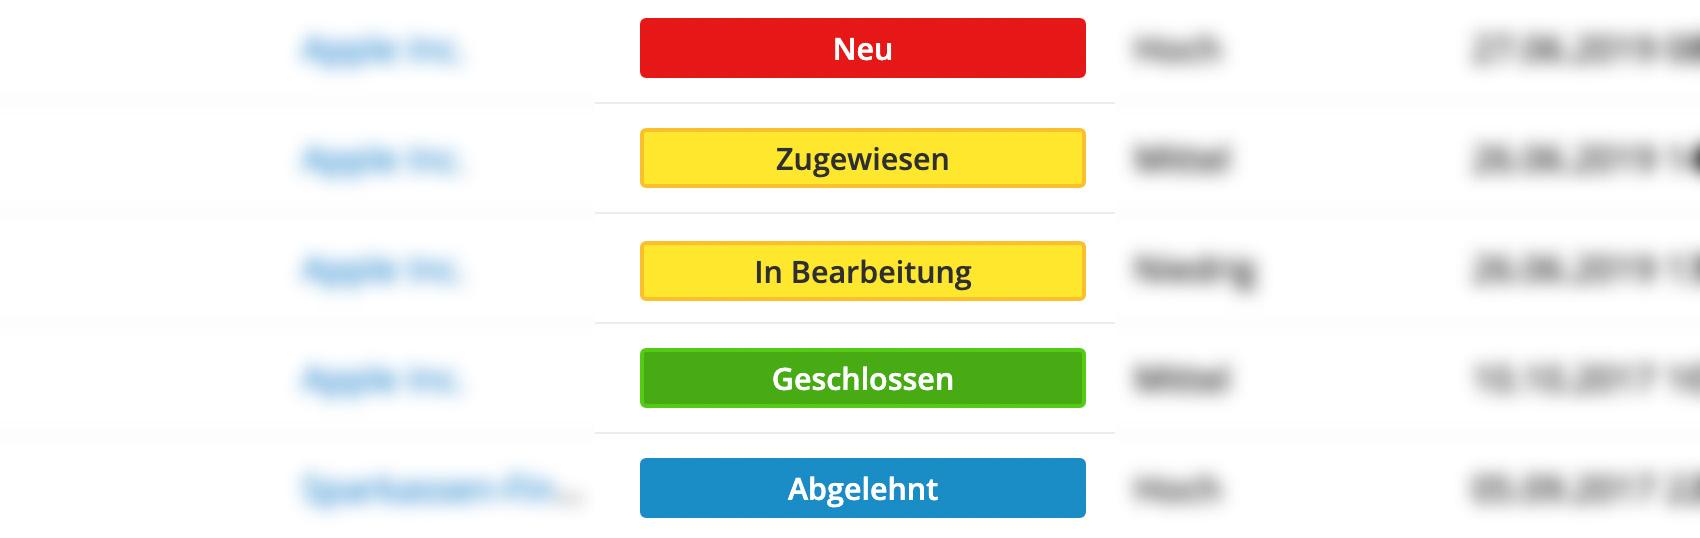 "Color-Coding für das ""Status"" Feld in dem Tickets Modul"